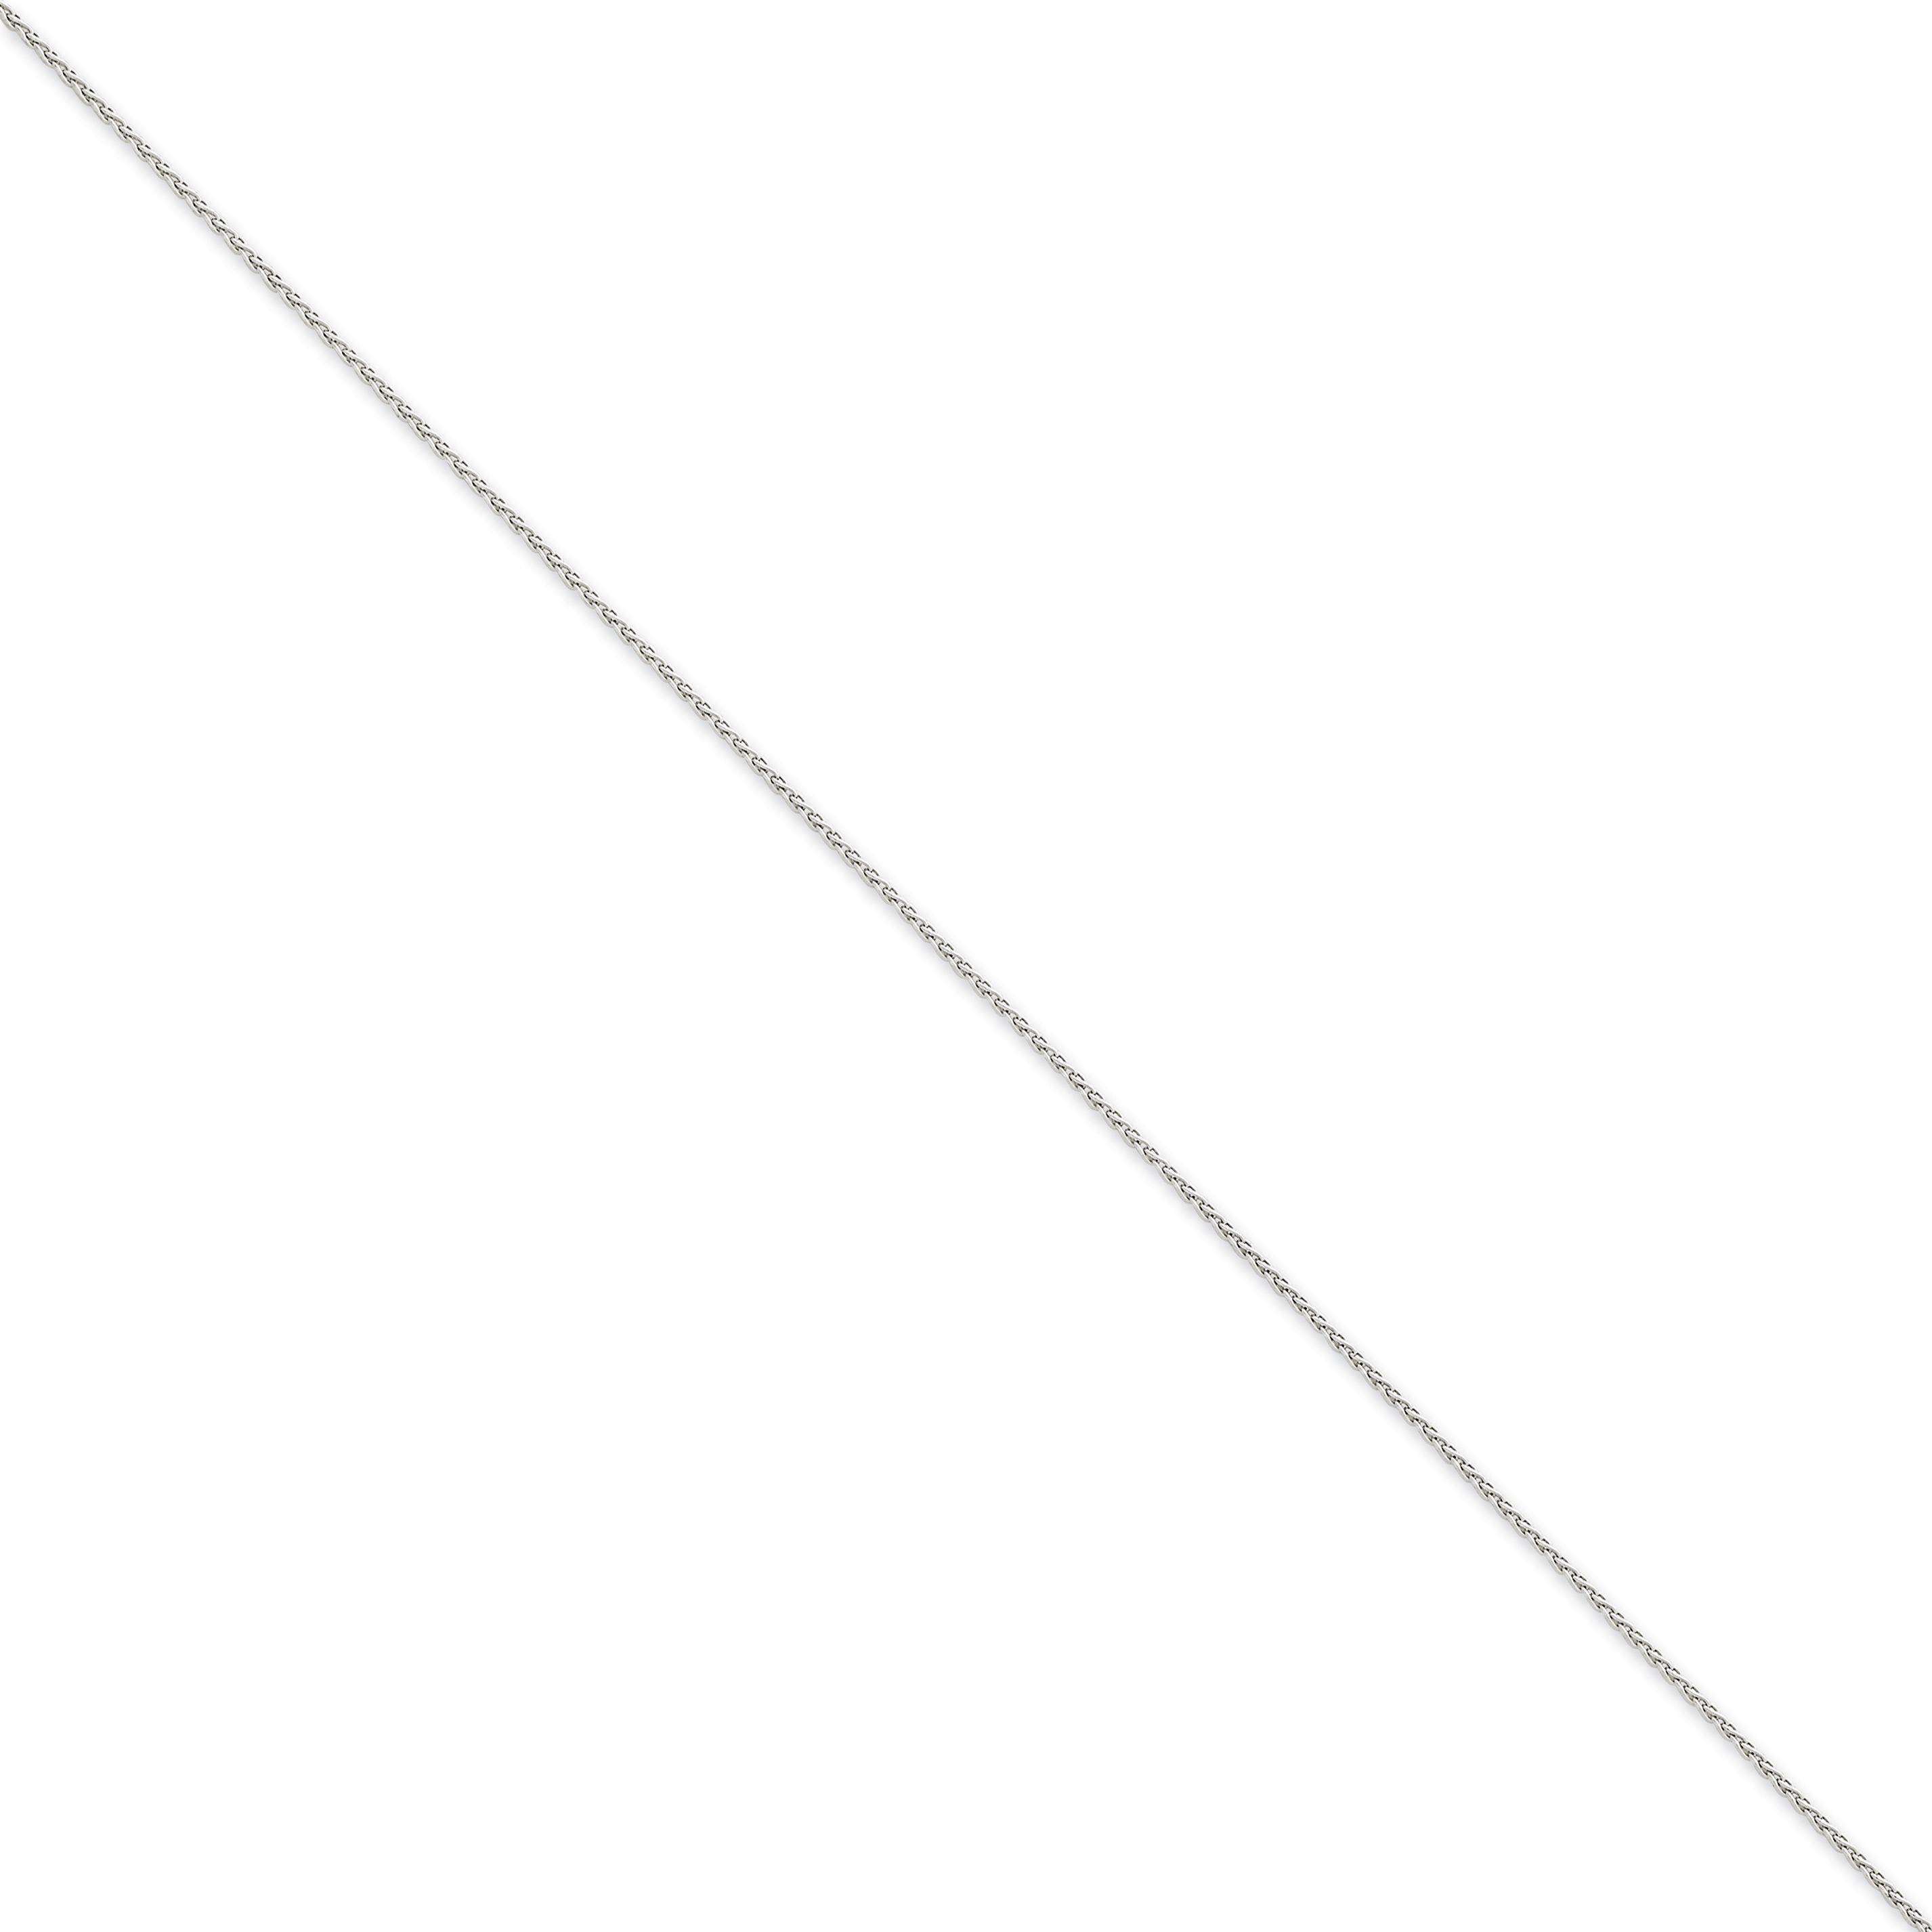 14K White Gold 1.2mm Parisian Wheat Chain - image 2 of 2